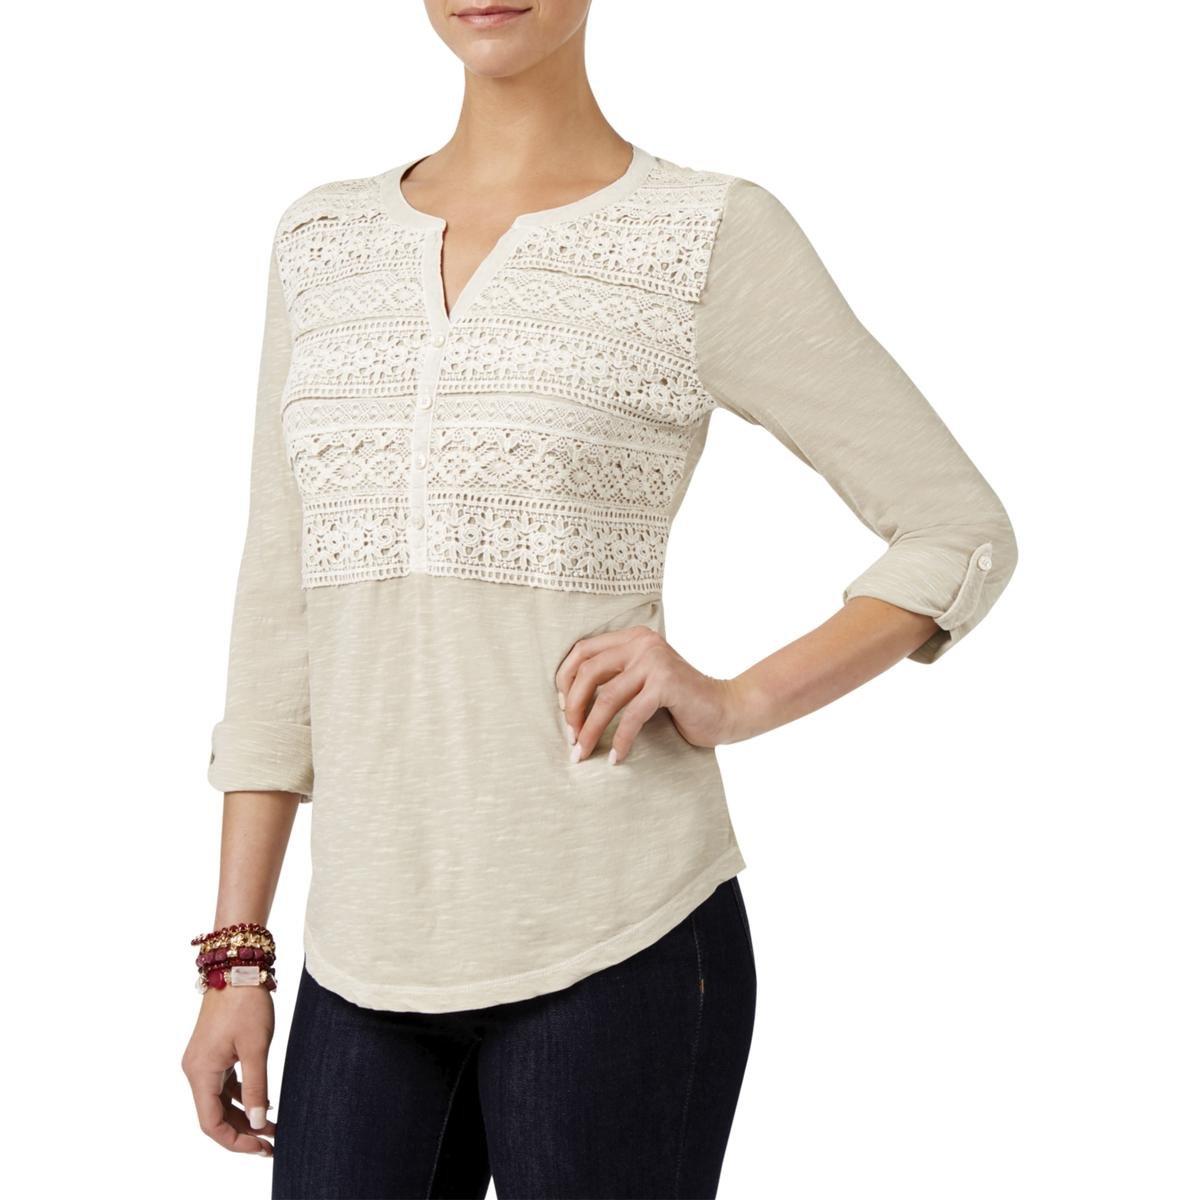 Style & Co. Womens Scallop Crochet Casual Top Beige XL